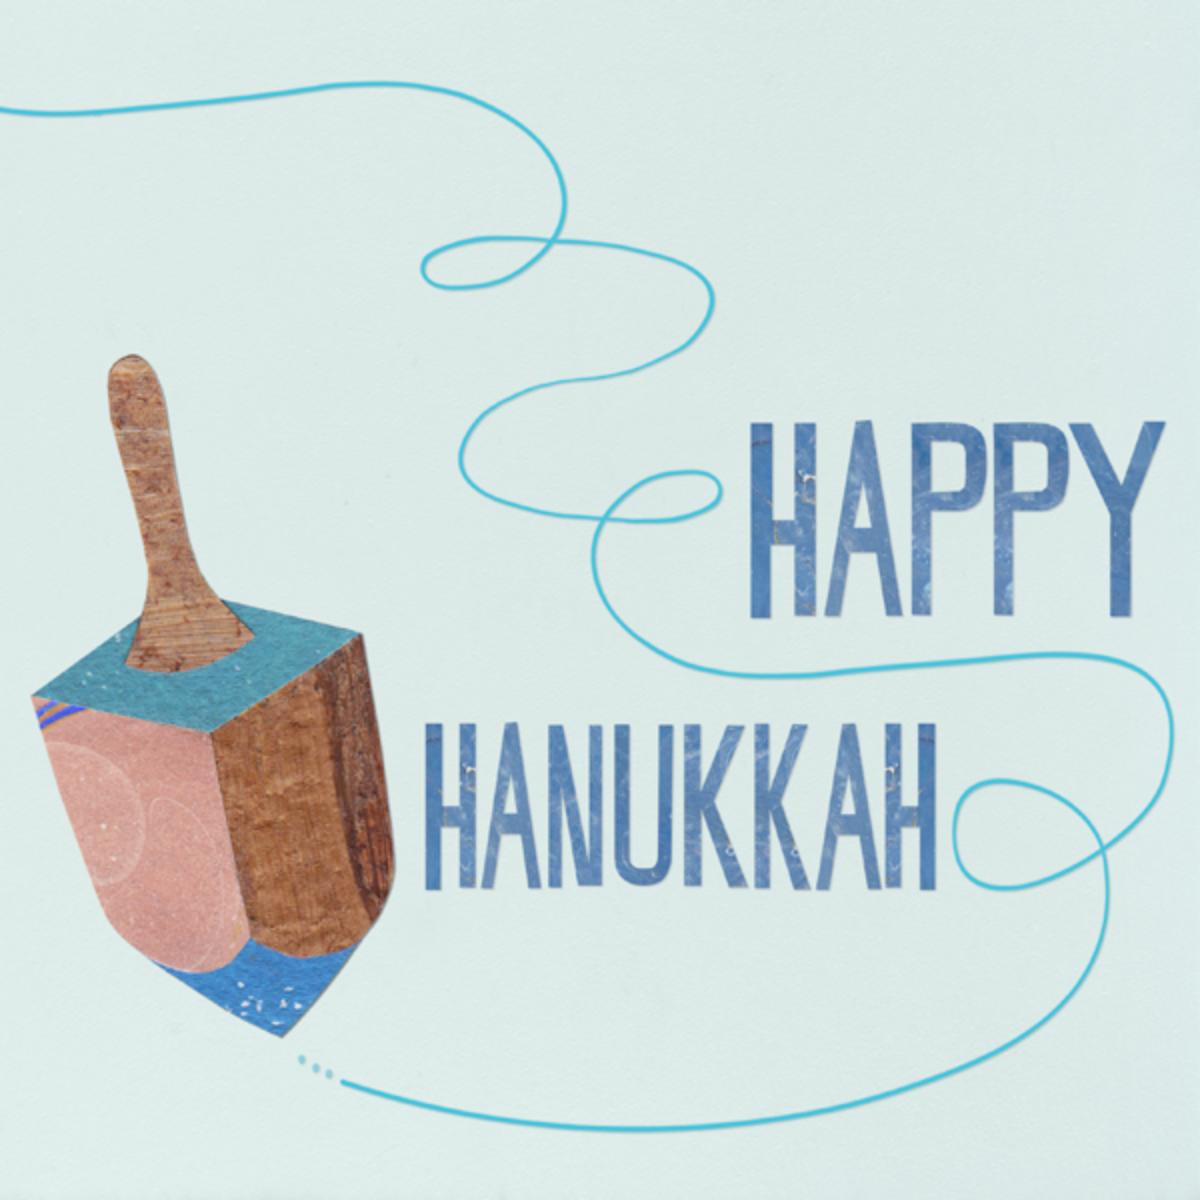 Dreidel - Paperless Post - Hanukkah